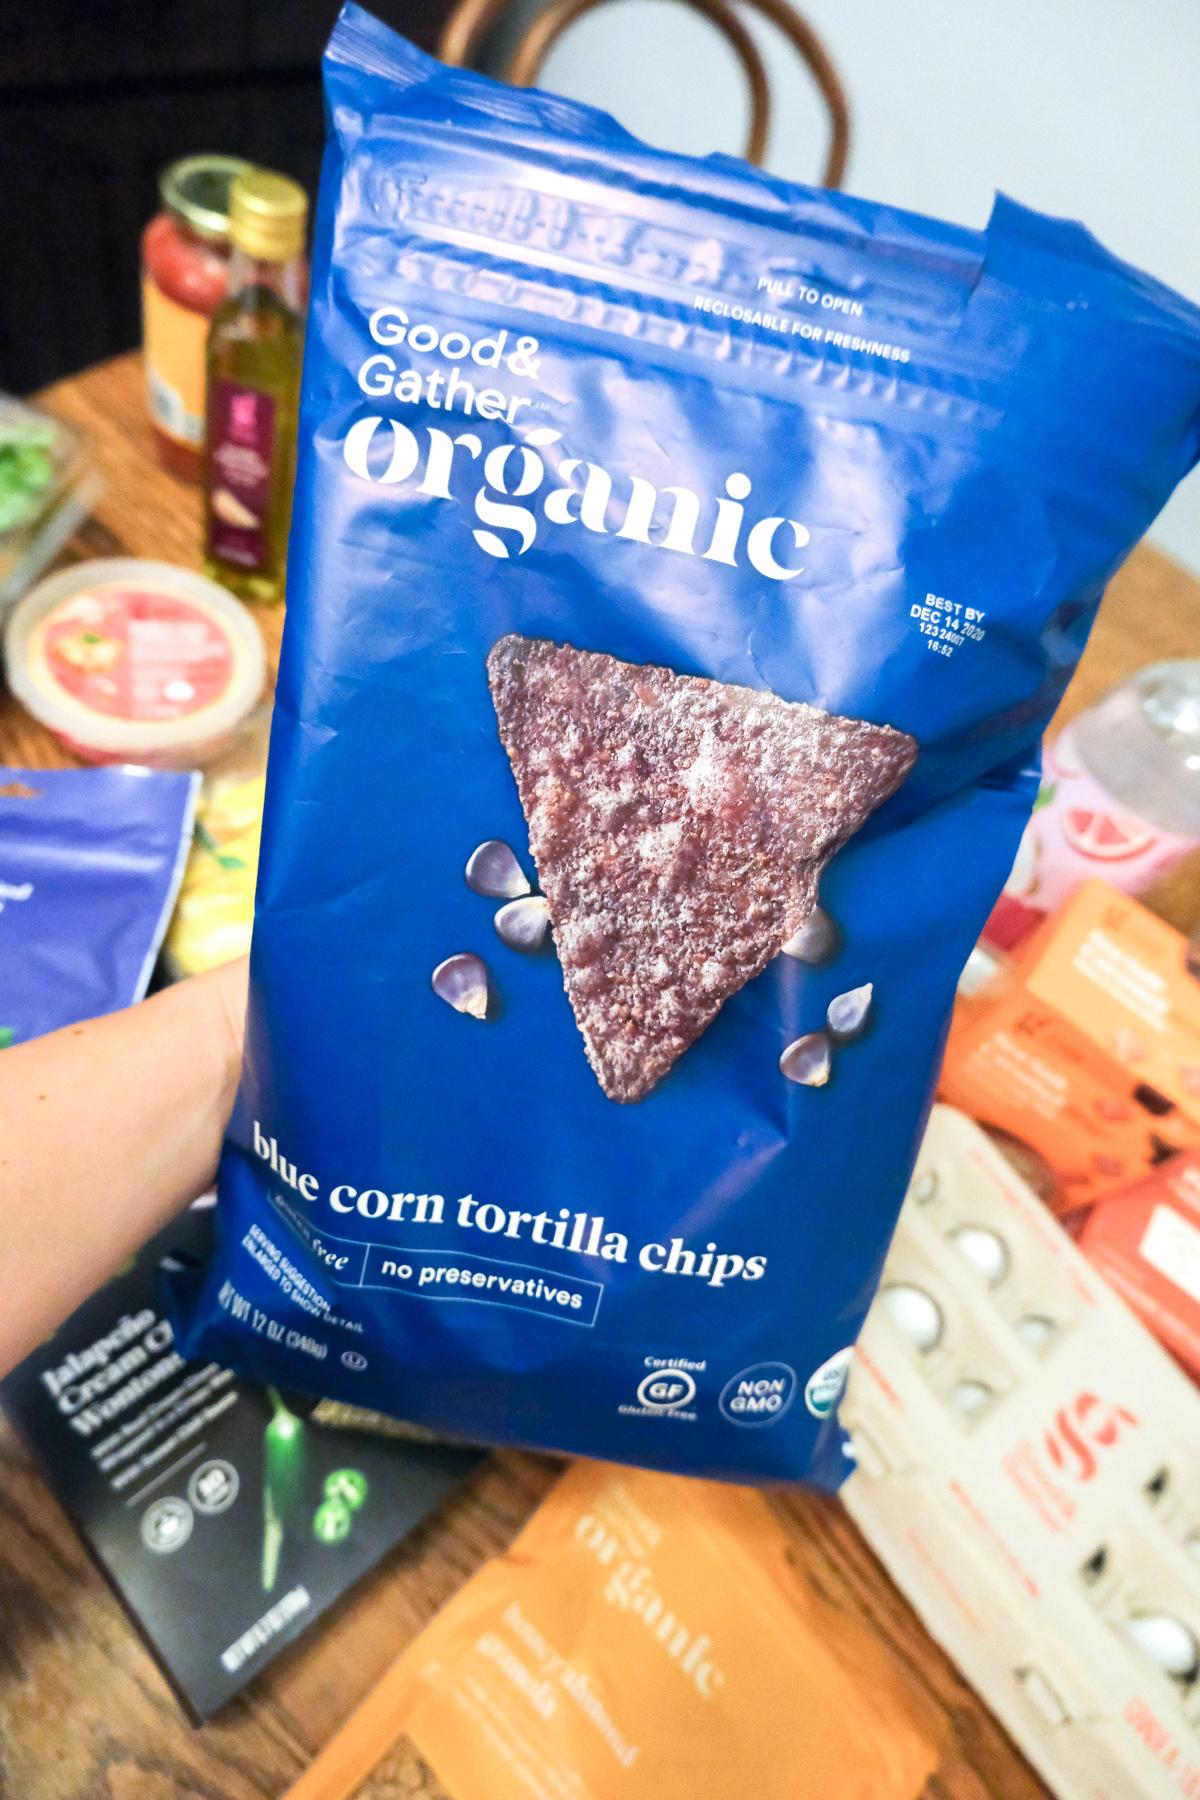 organic blue tortilla chips Good & Gather from Target